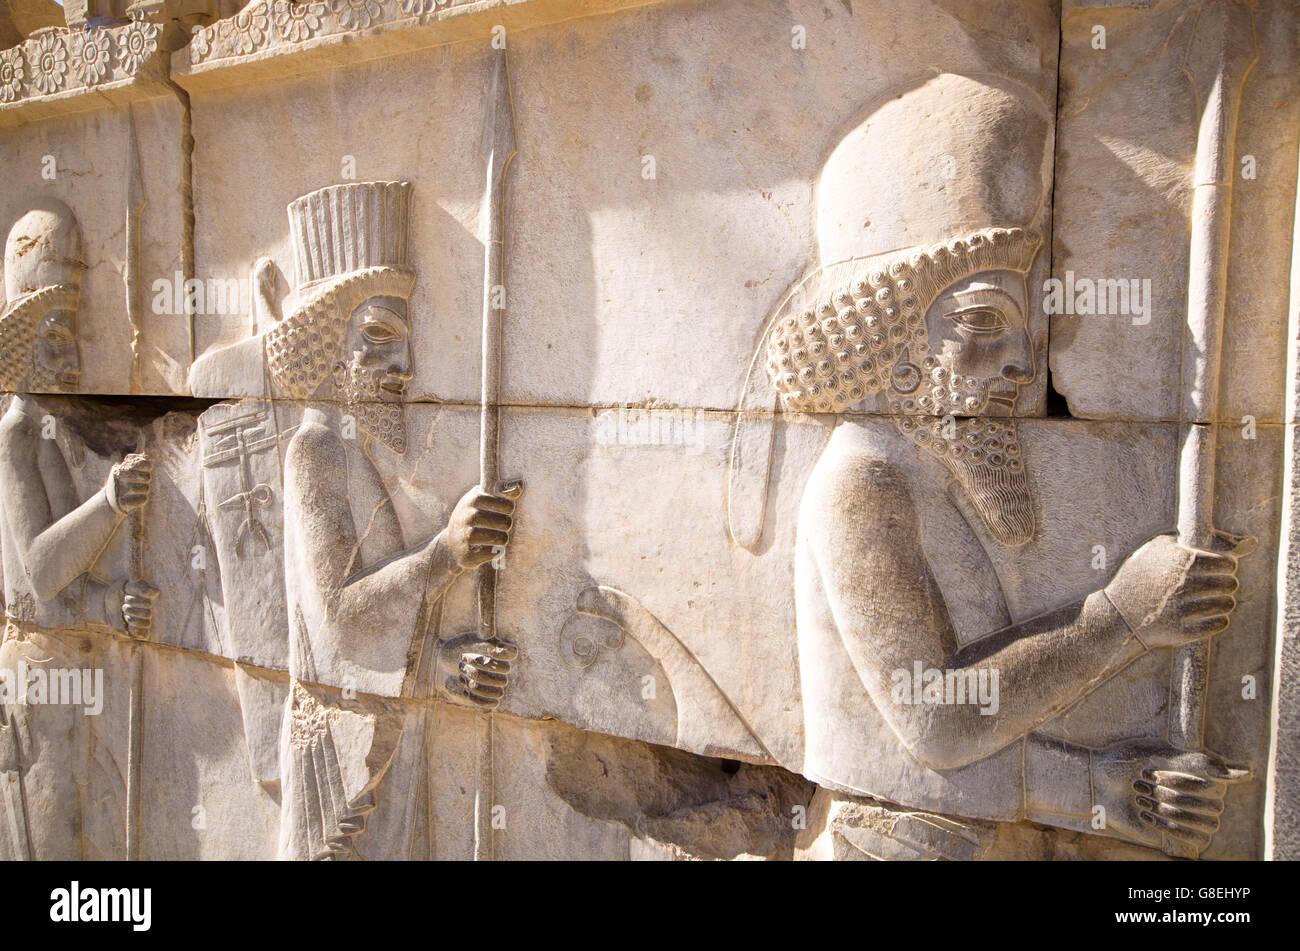 Soldado aqueménida cifras sobre la pared en Persépolis Foto de stock